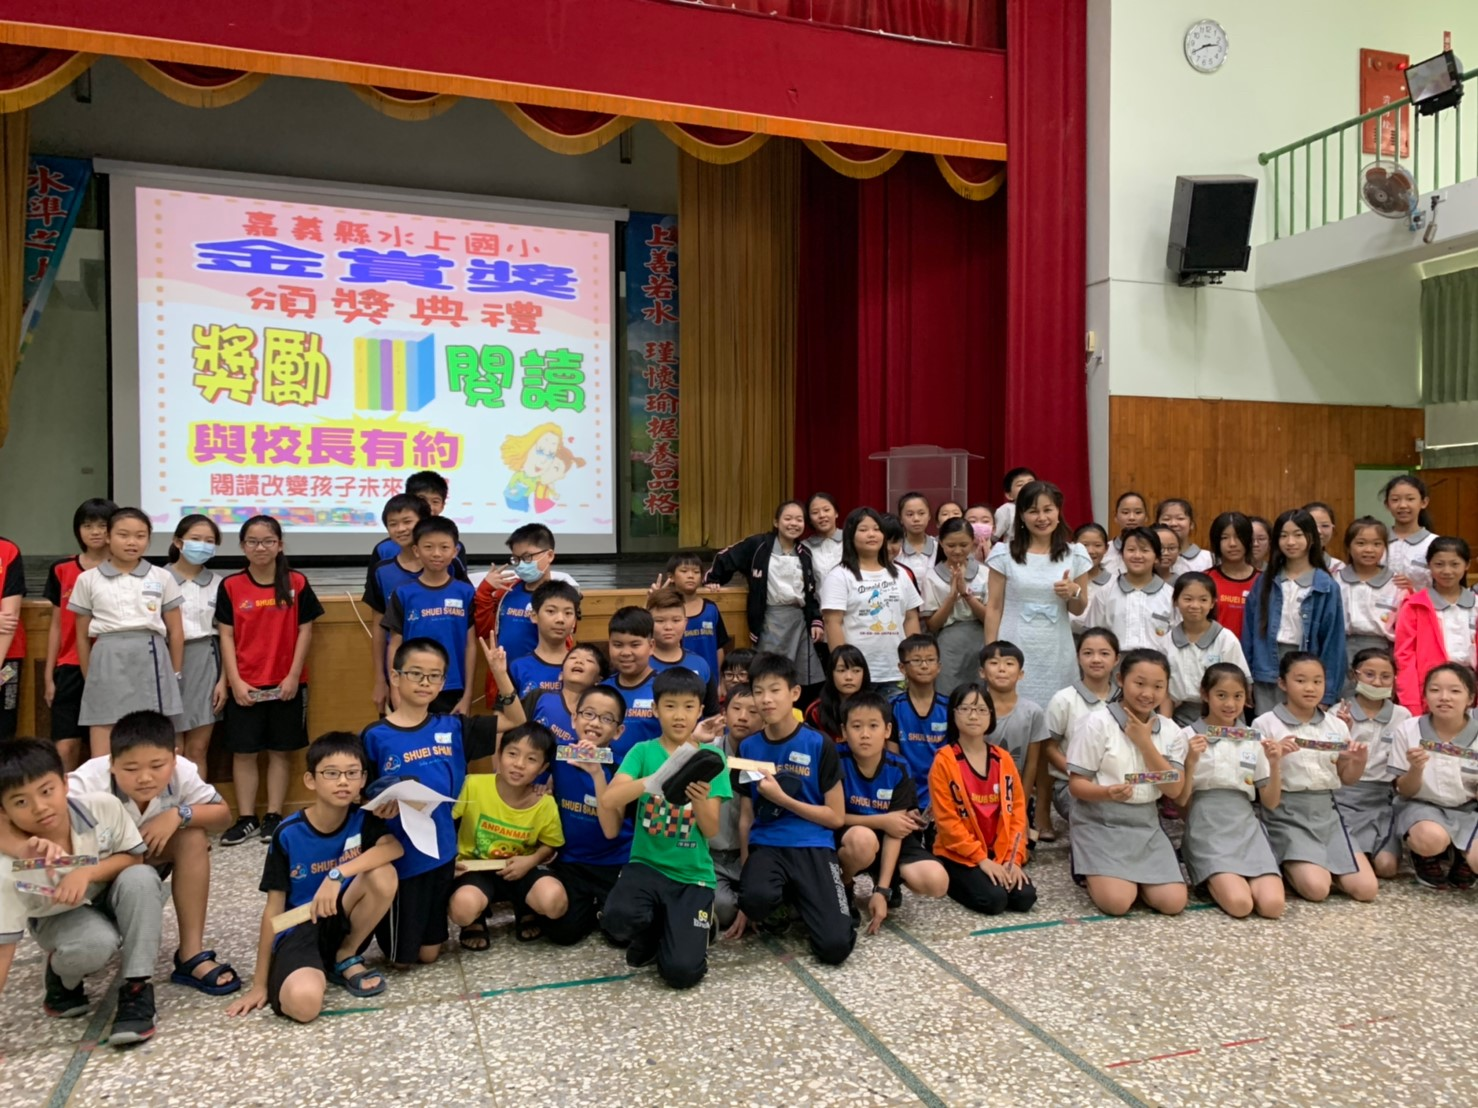 http://www.shsps.cyc.edu.tw/uploads/tadgallery/2019_06_24/1390_金賞獎_190621_0010.jpg